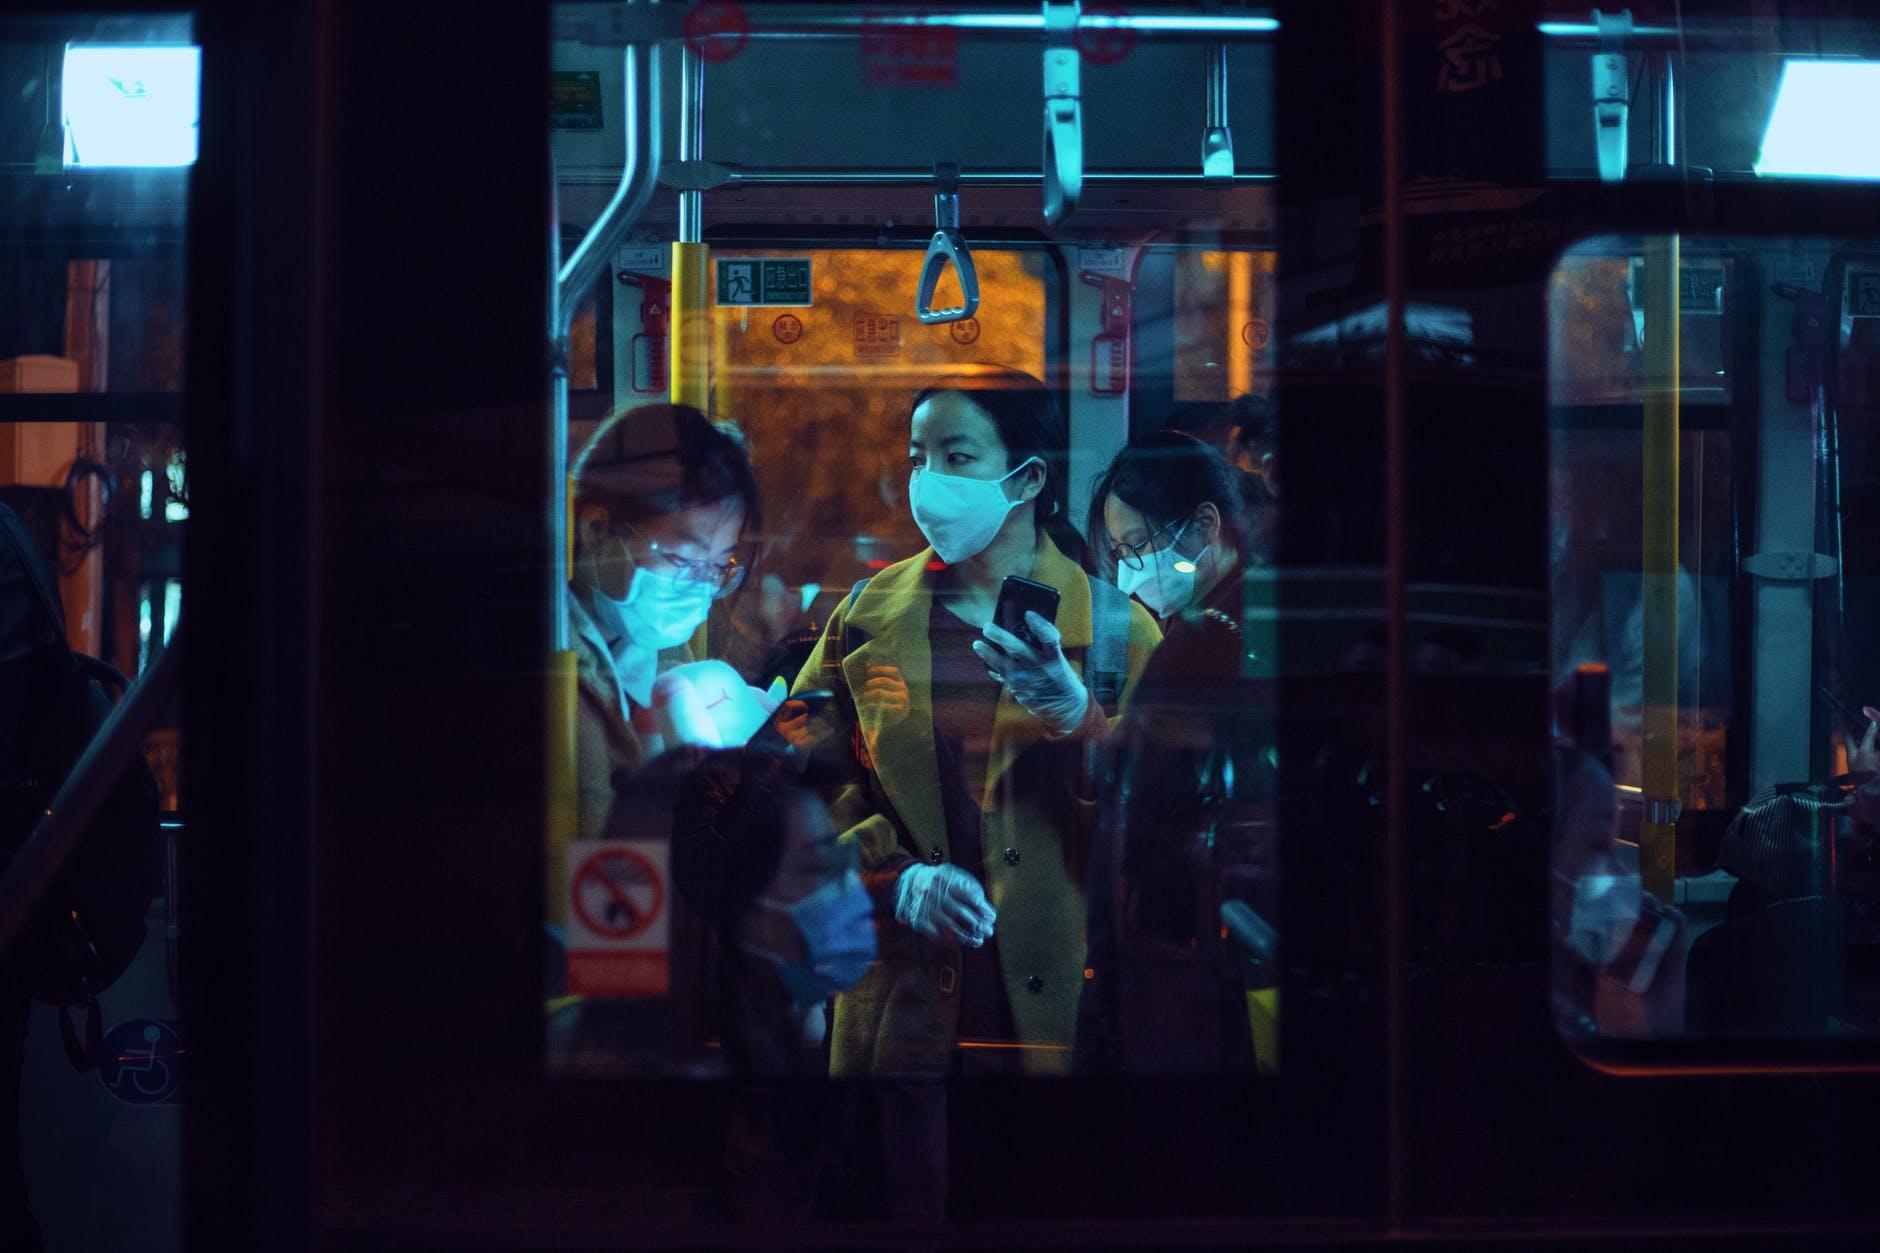 people inside a bus wearing masks